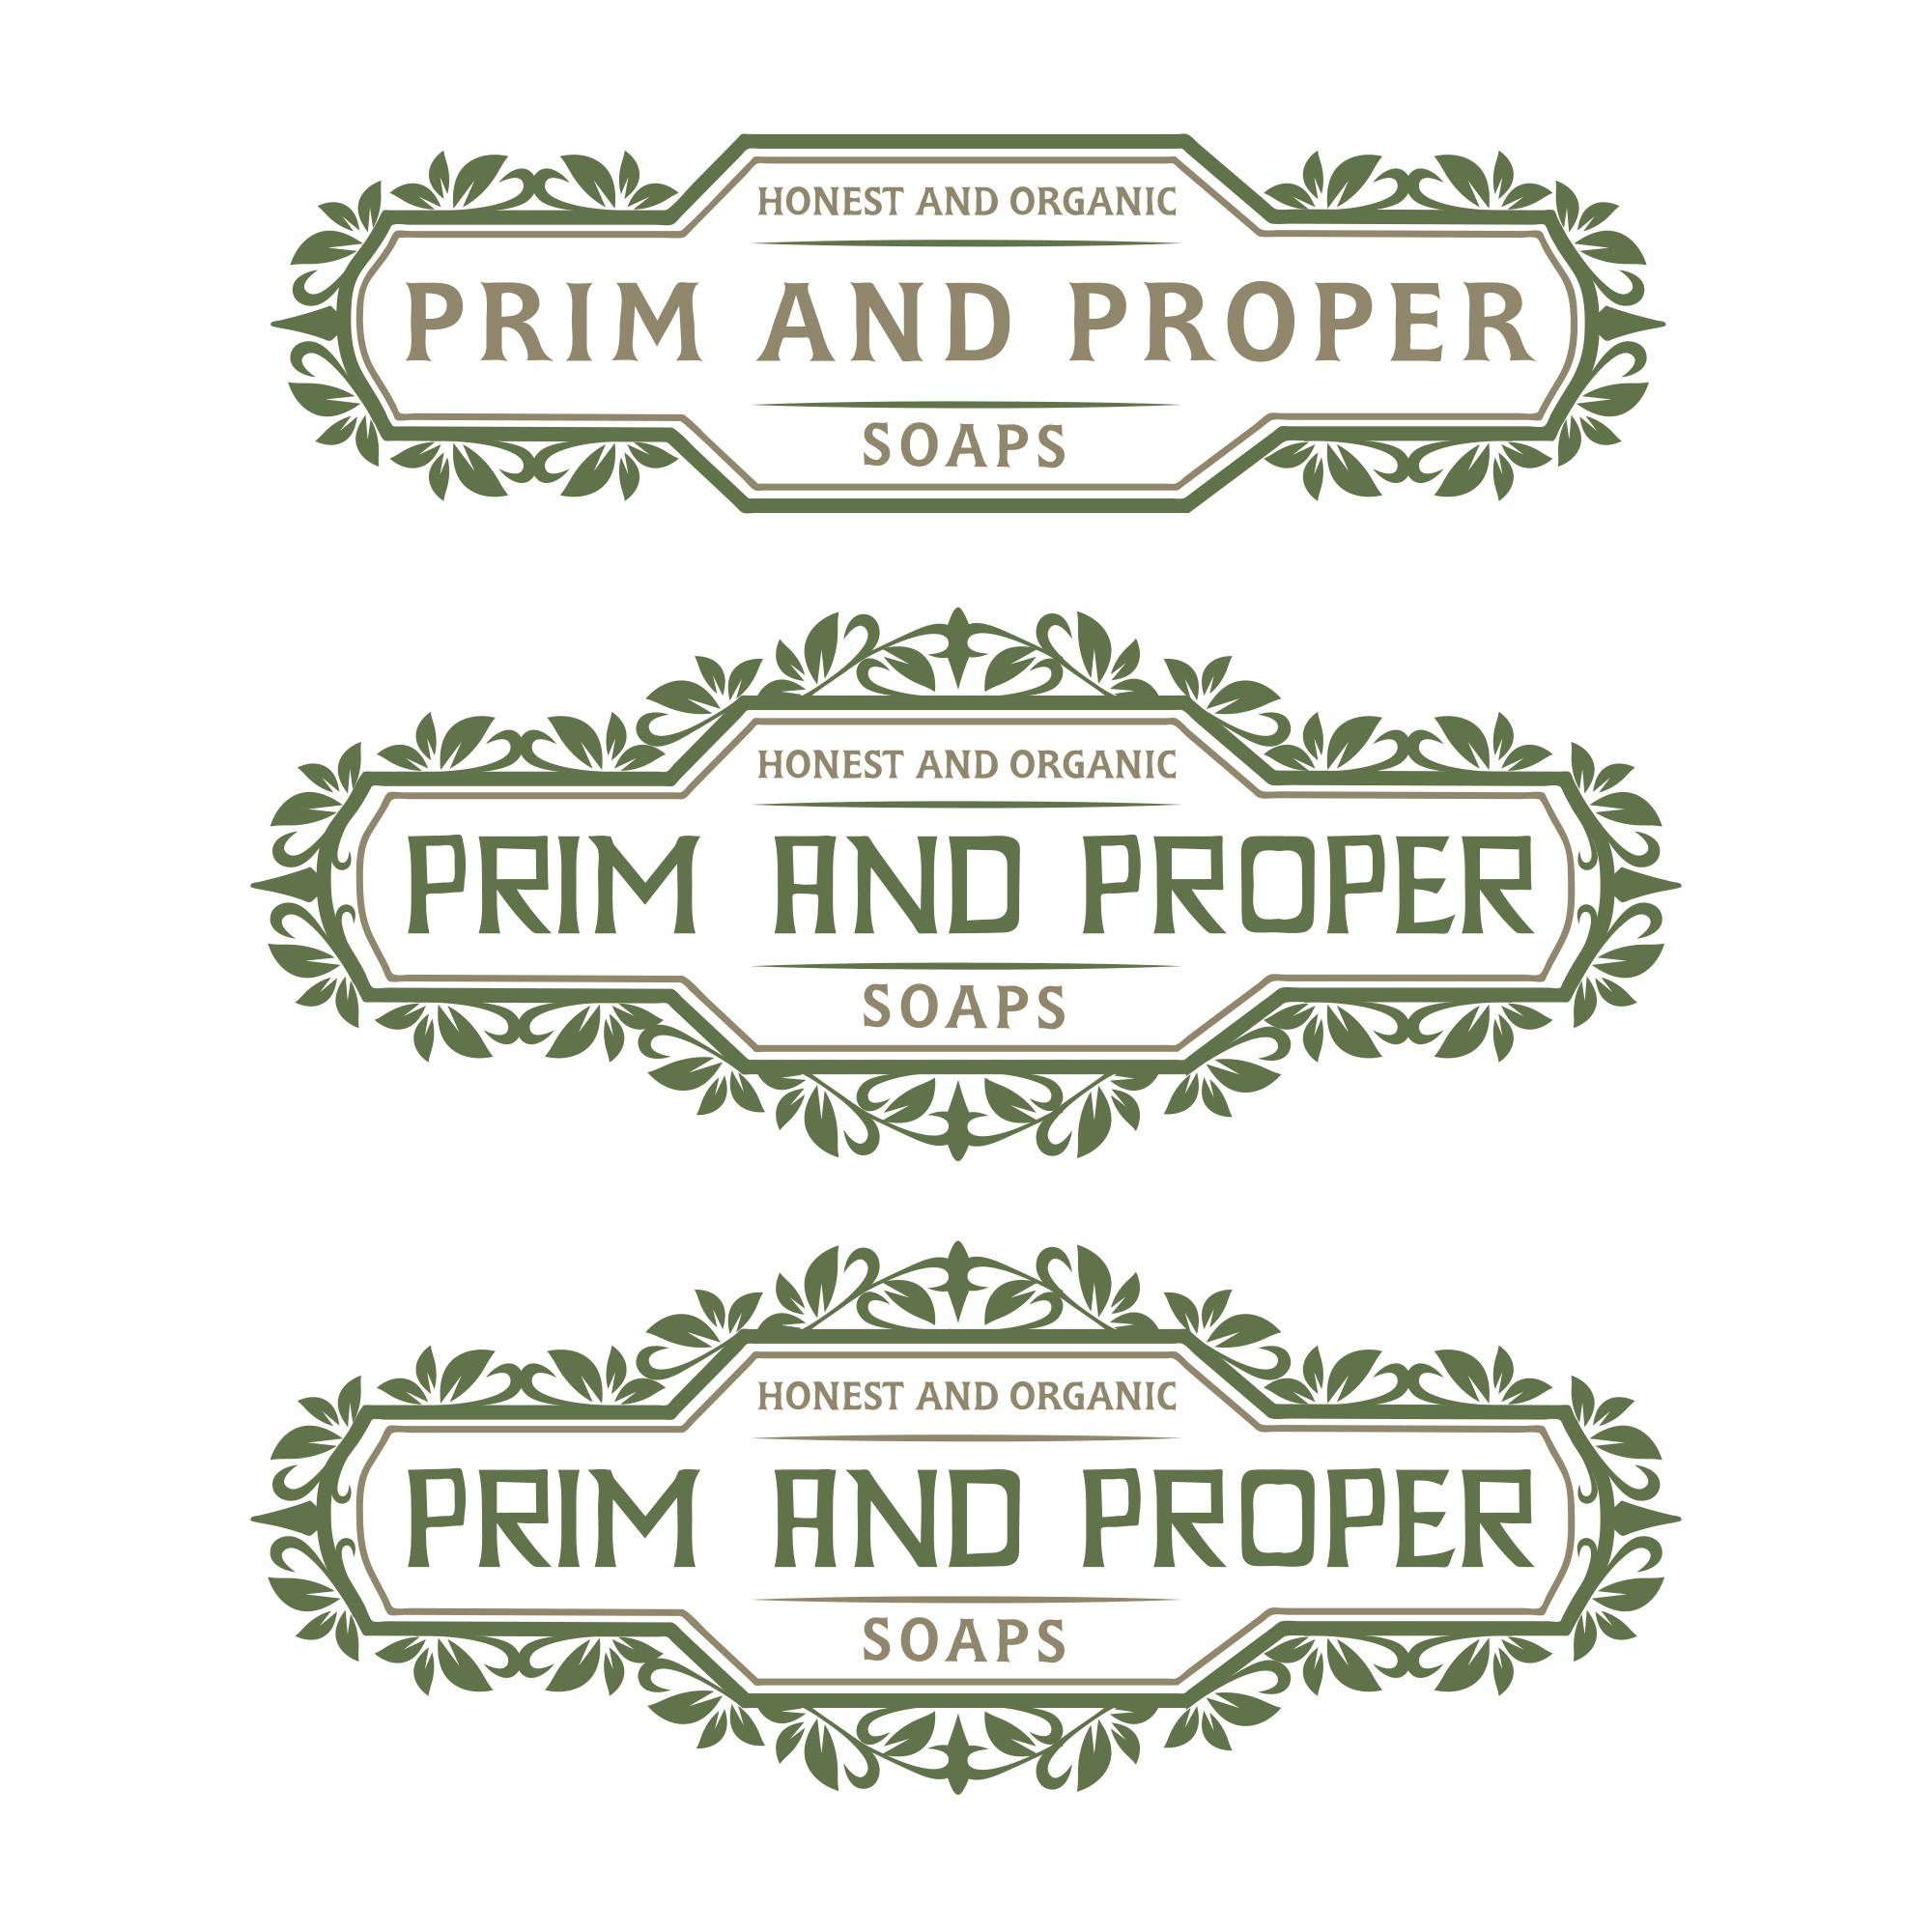 Prim and Proper Organic Soaps